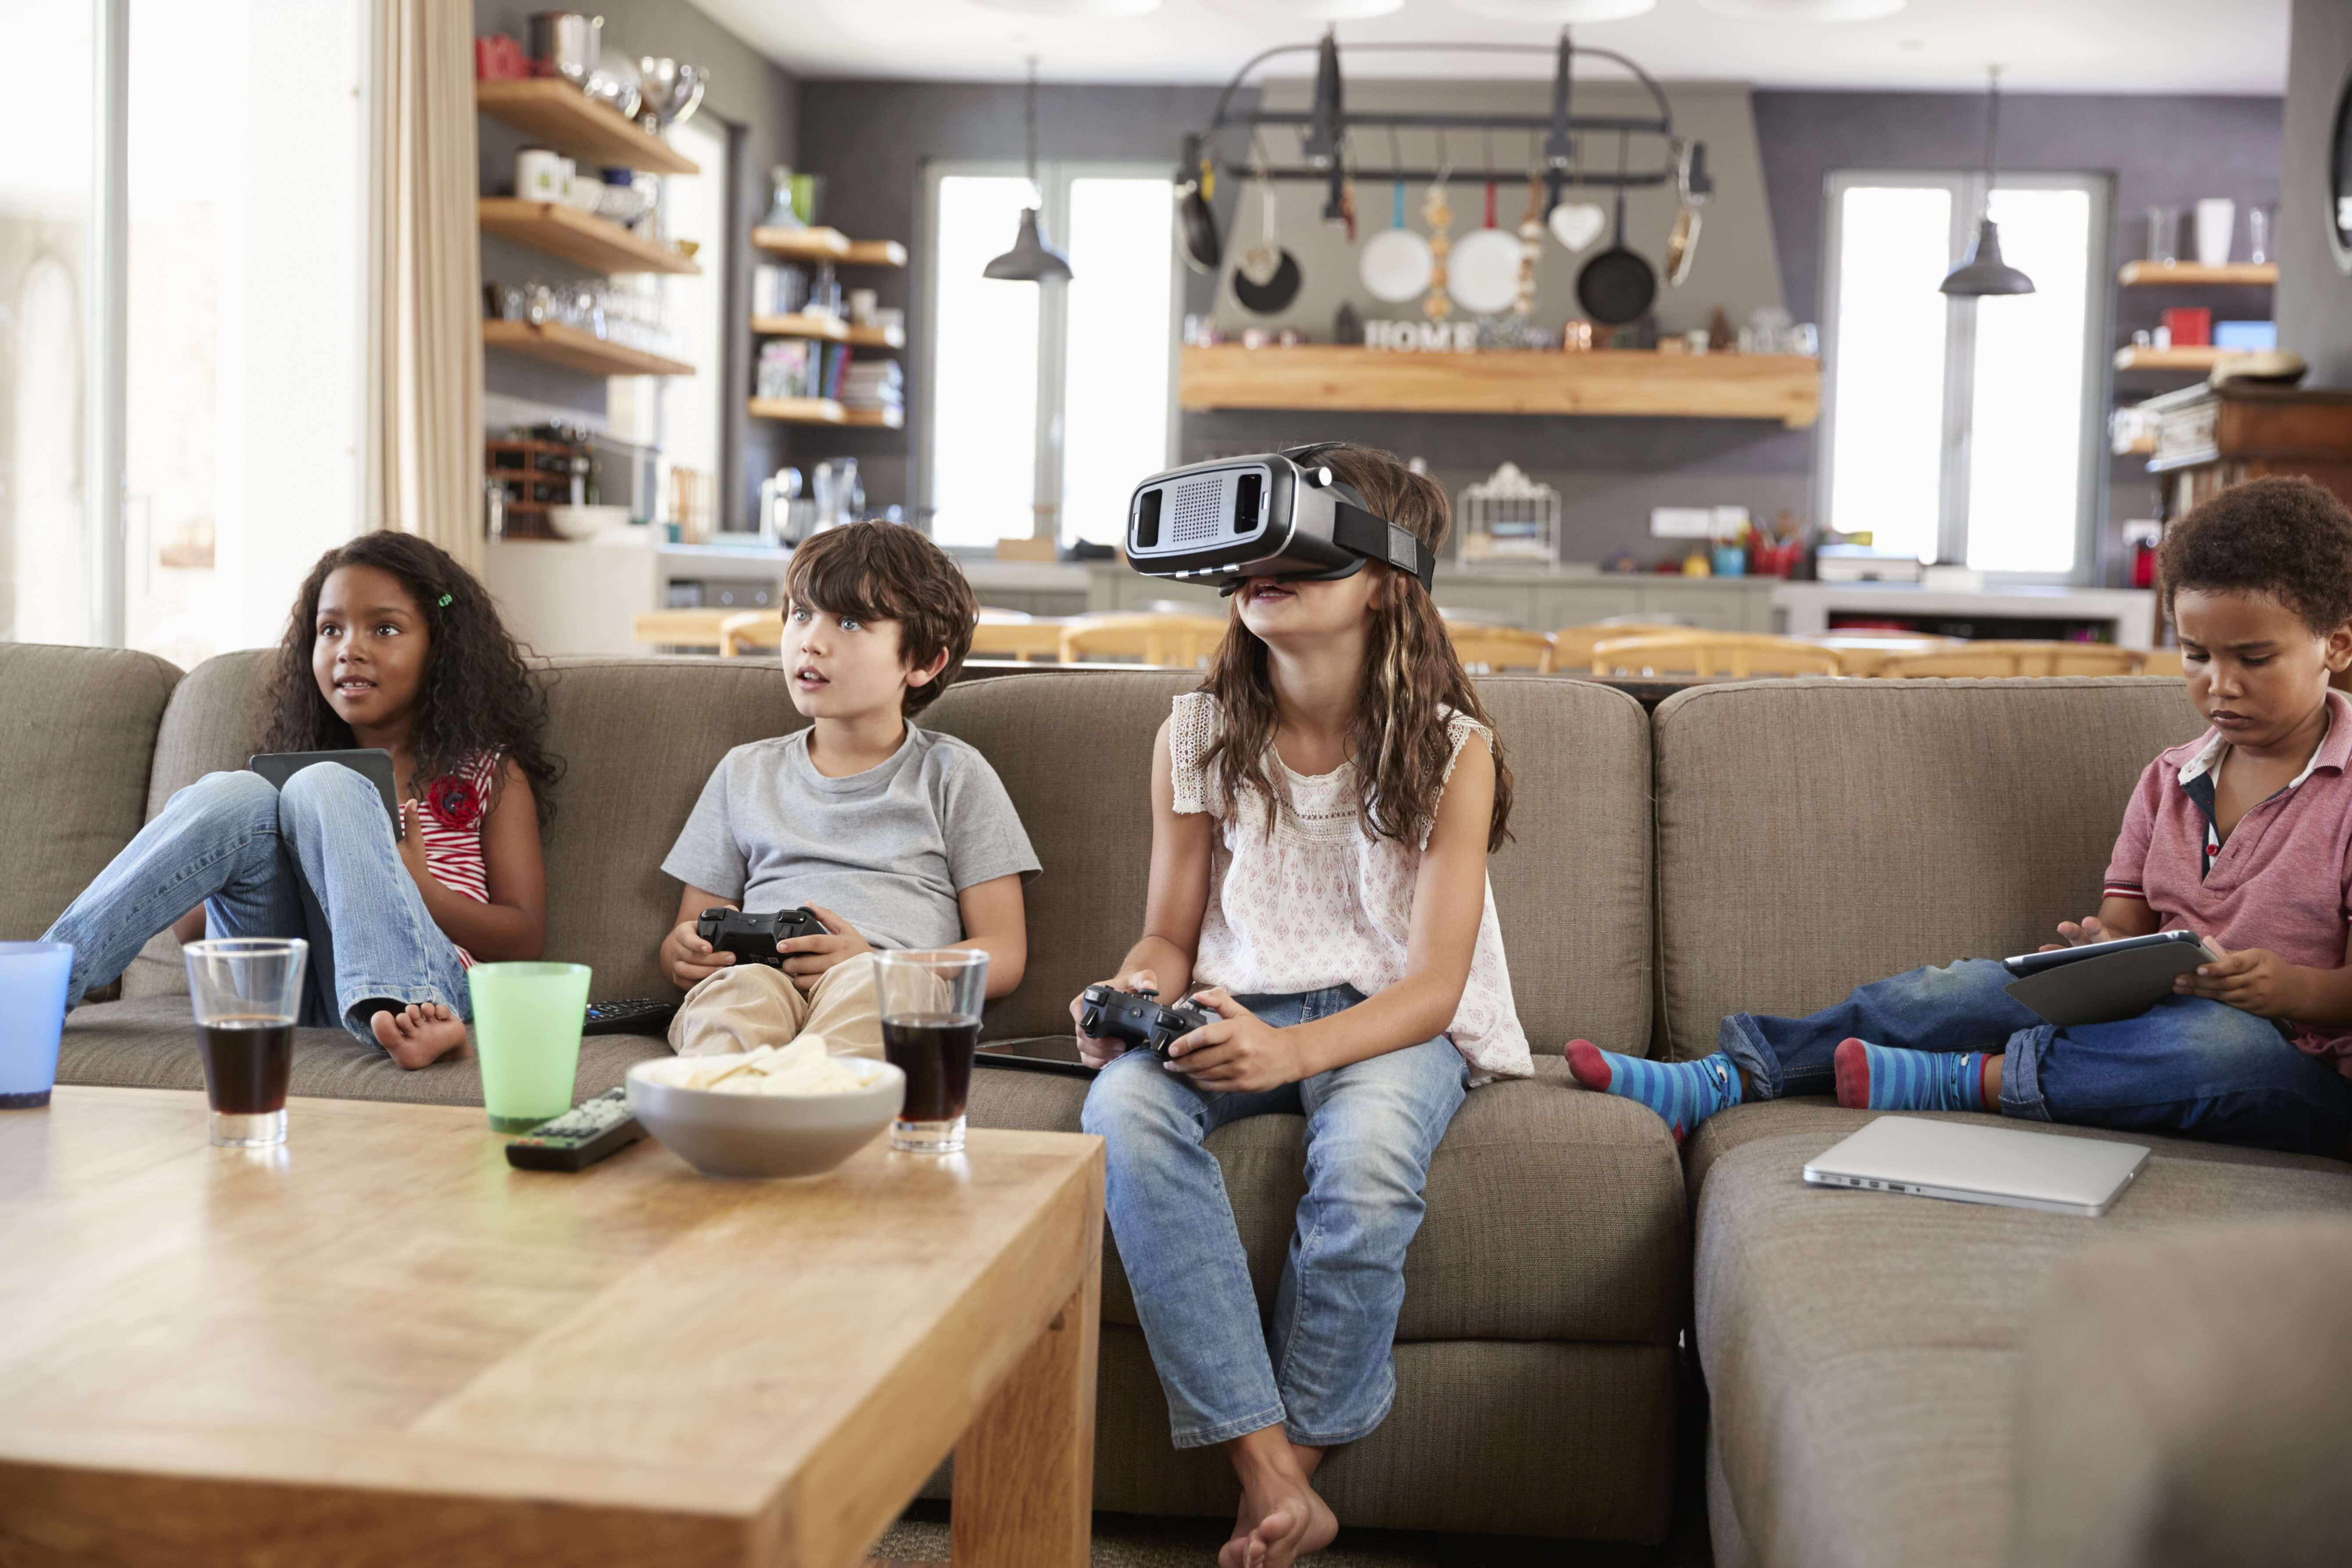 Børn der spiller computer